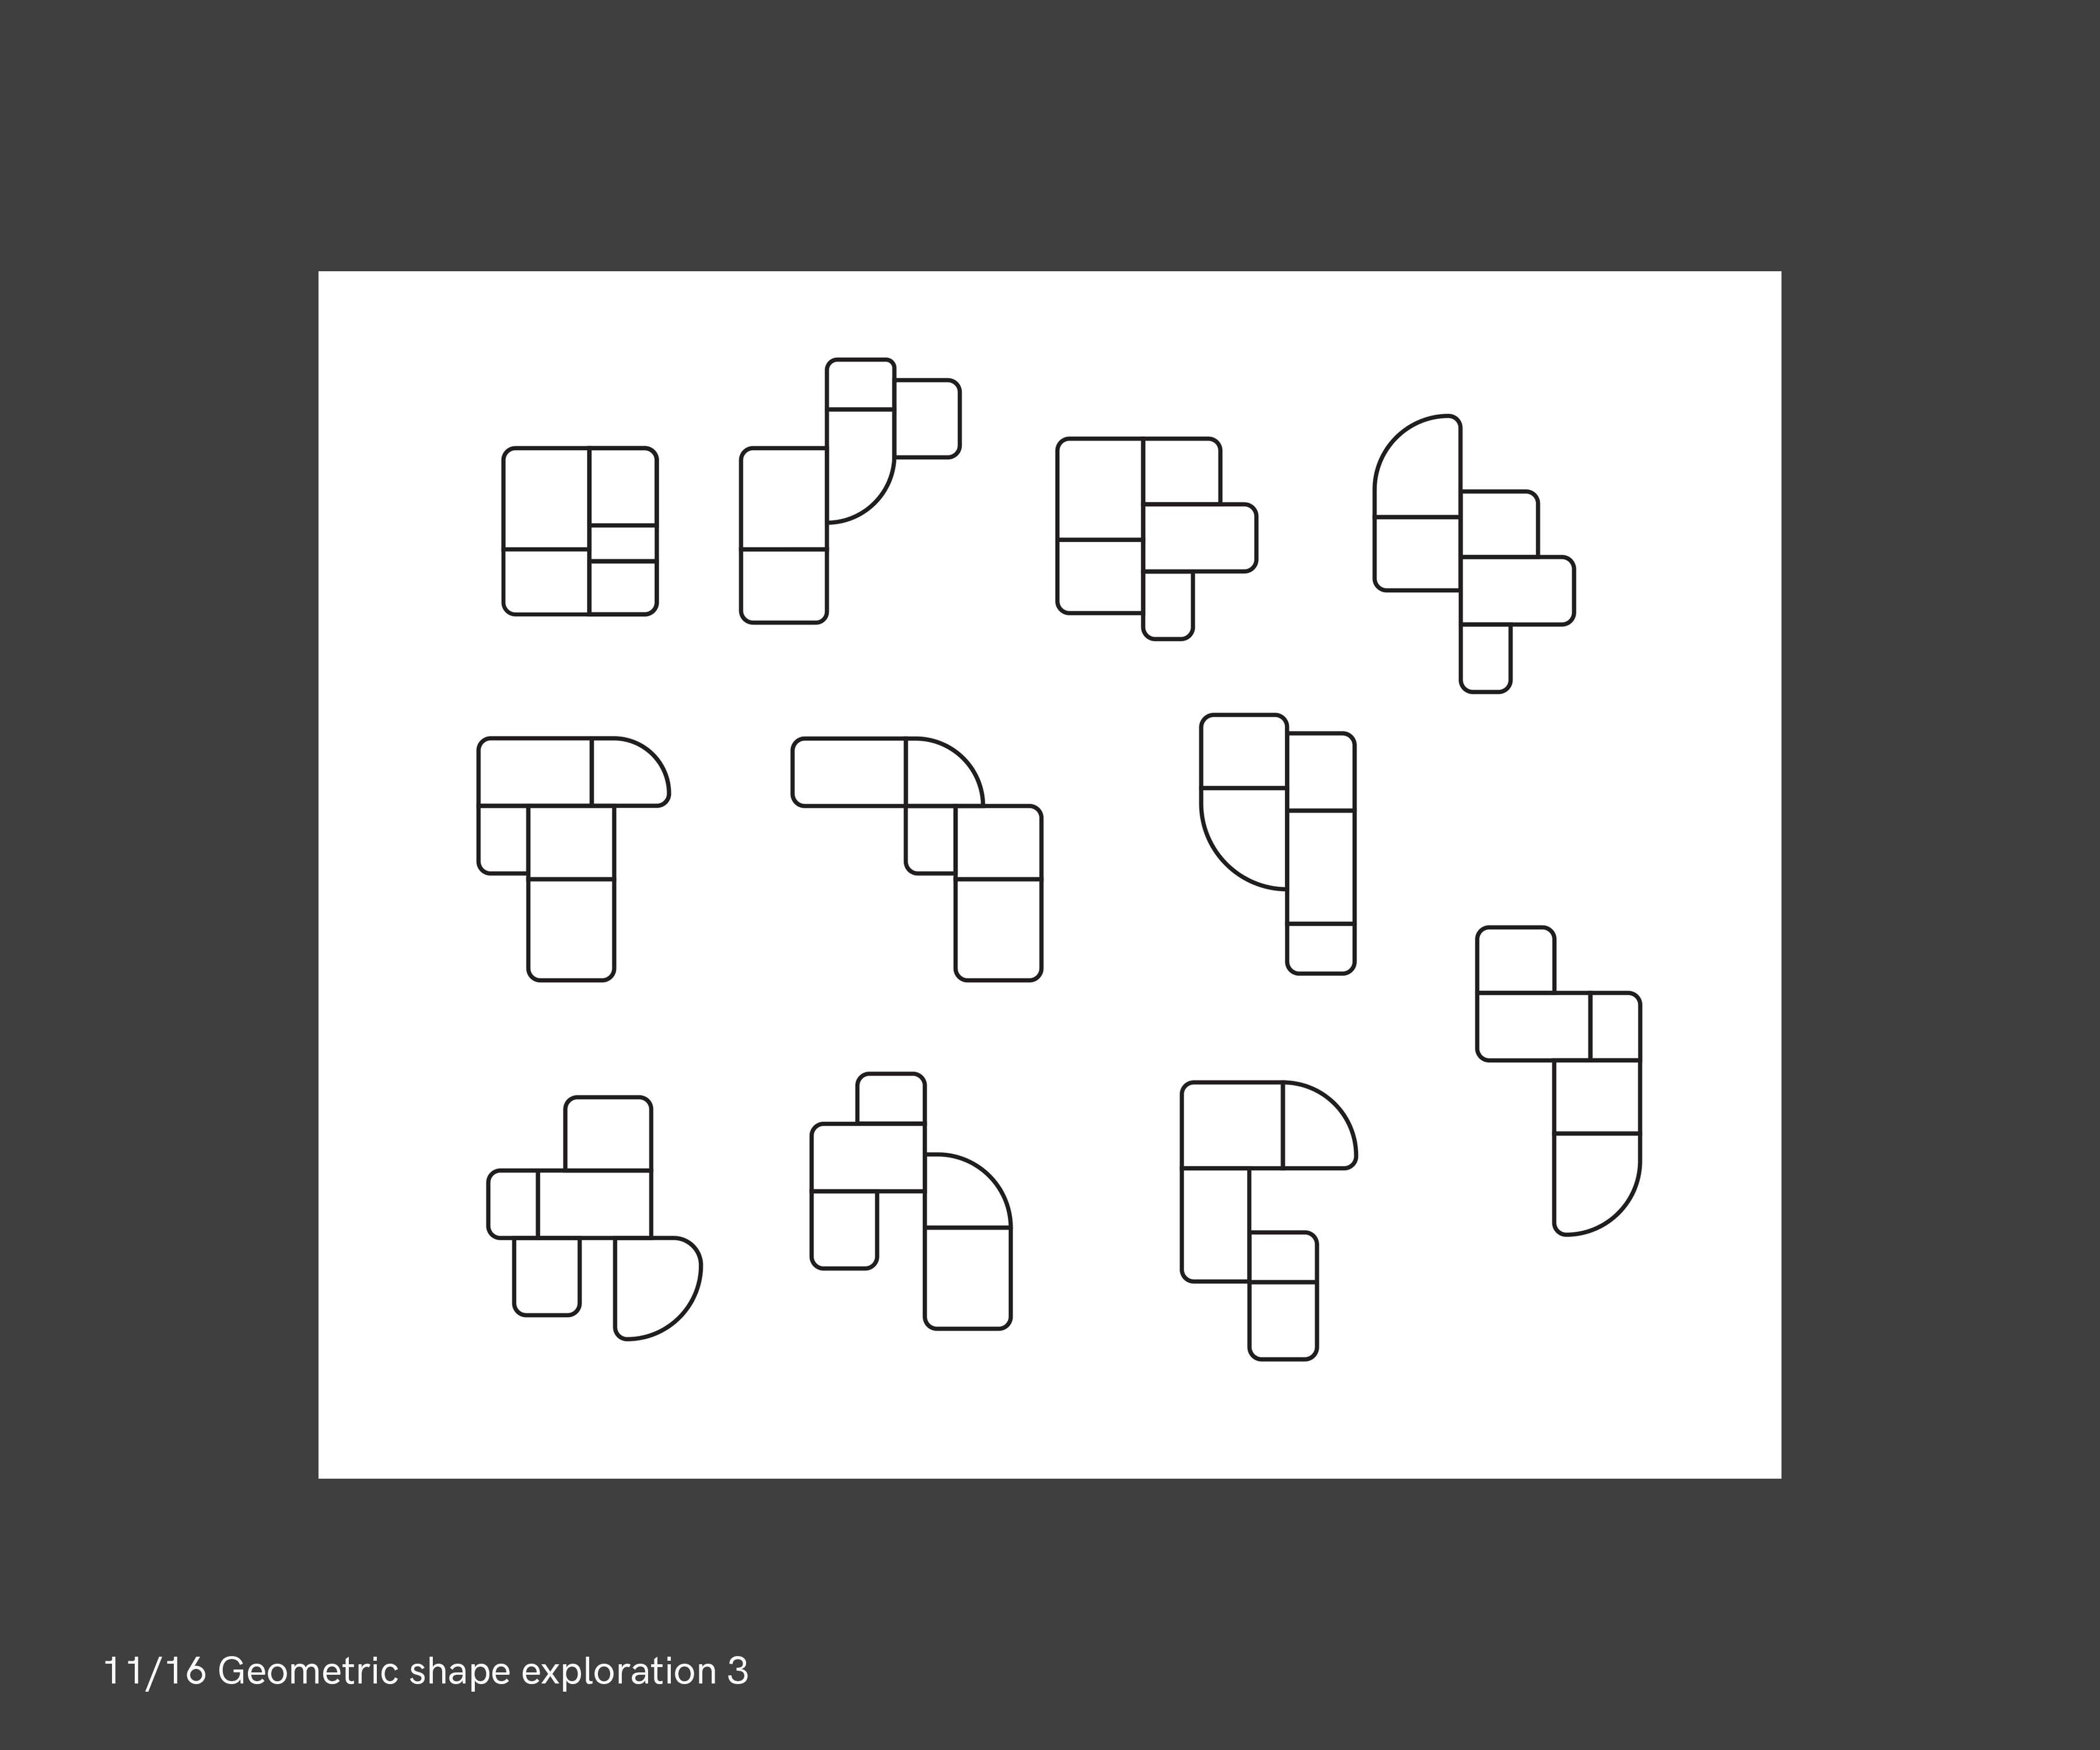 b_process_logo1_digital-11.1